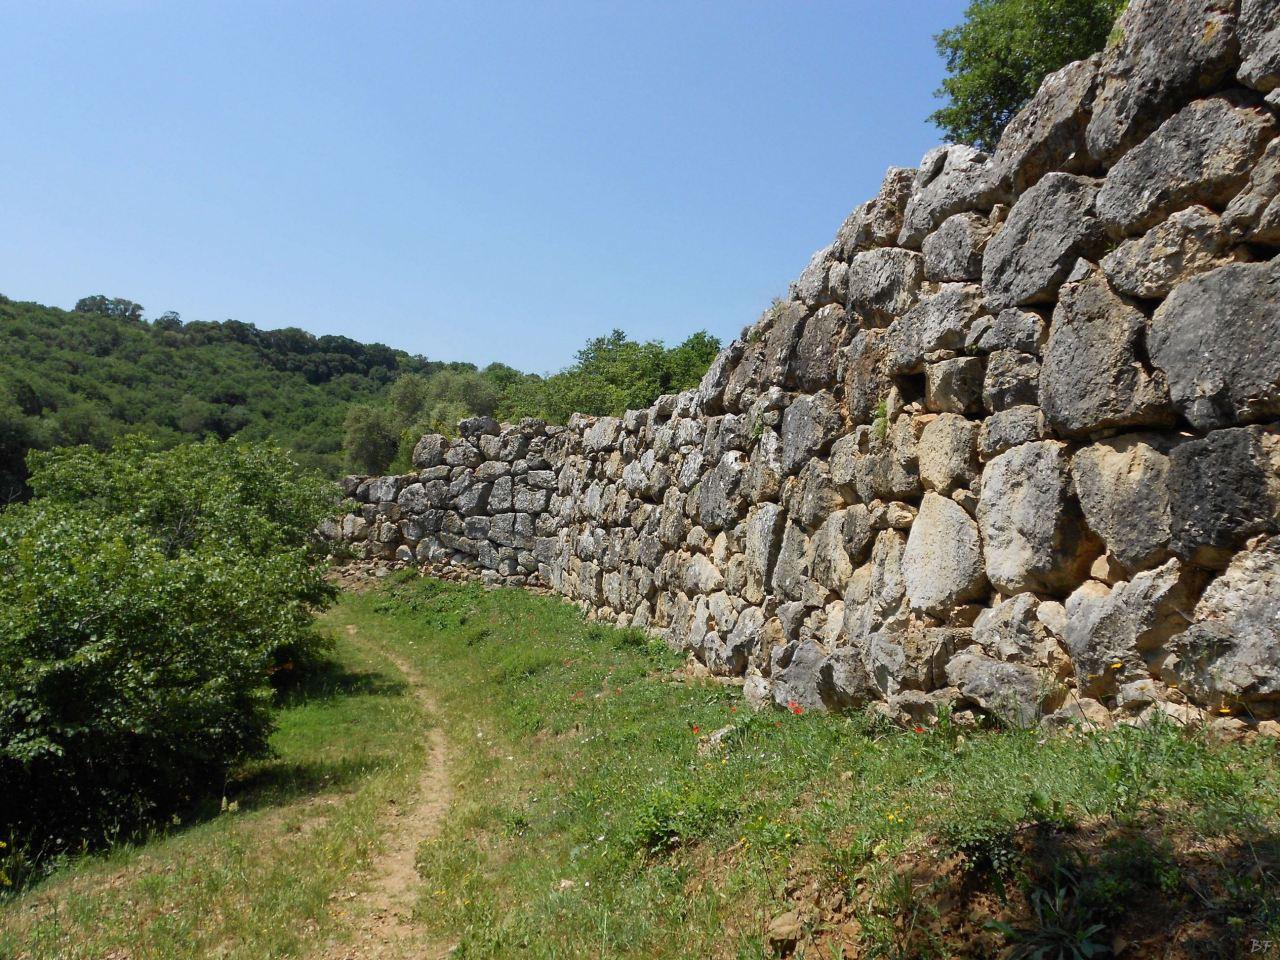 Roselle-Mura-Megalitiche-Roselle-Grosseto-Toscana-Italia-4